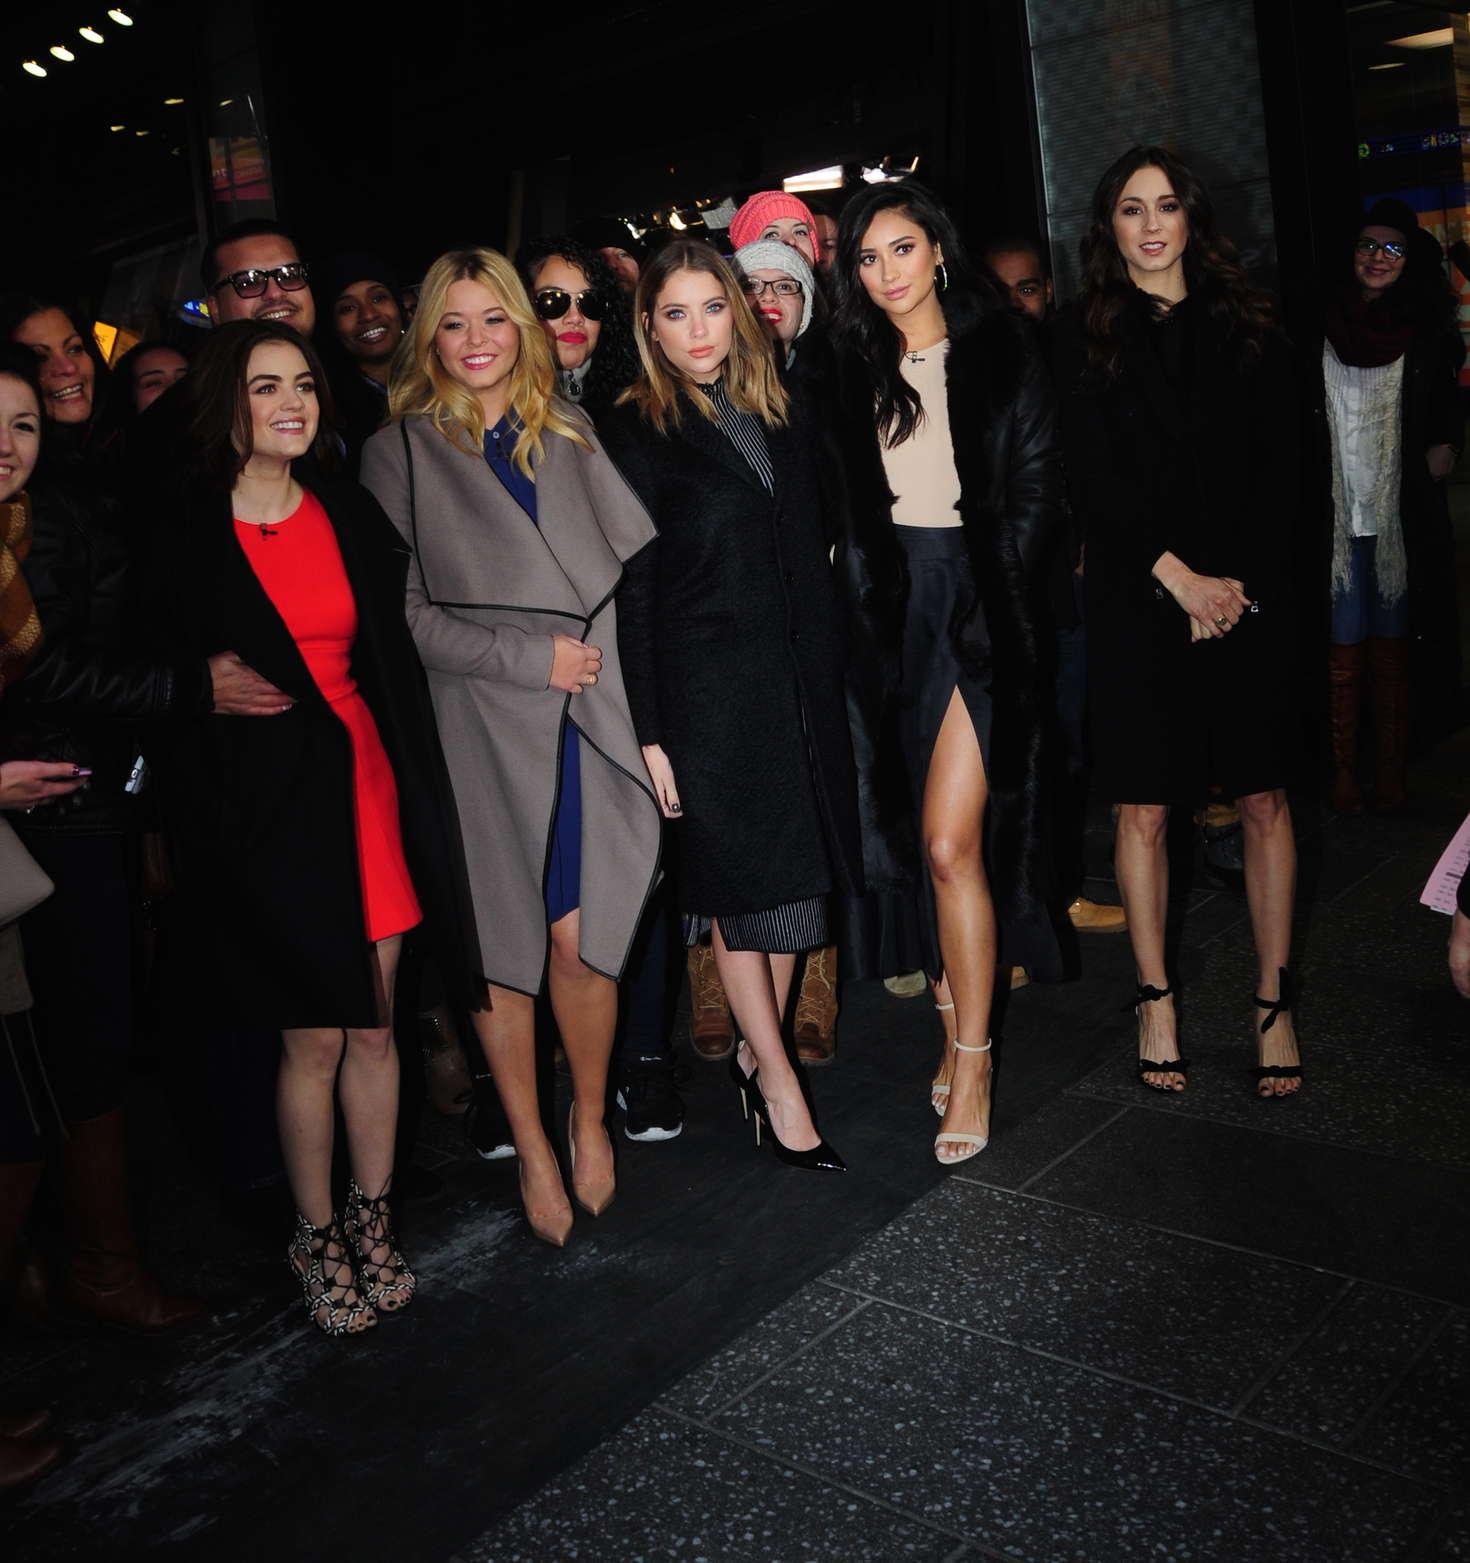 Ashley Benson, Lucy Hale, Shay Mitchell, Troian Bellisario and Sasha Pieterse - Good Morning America in NY